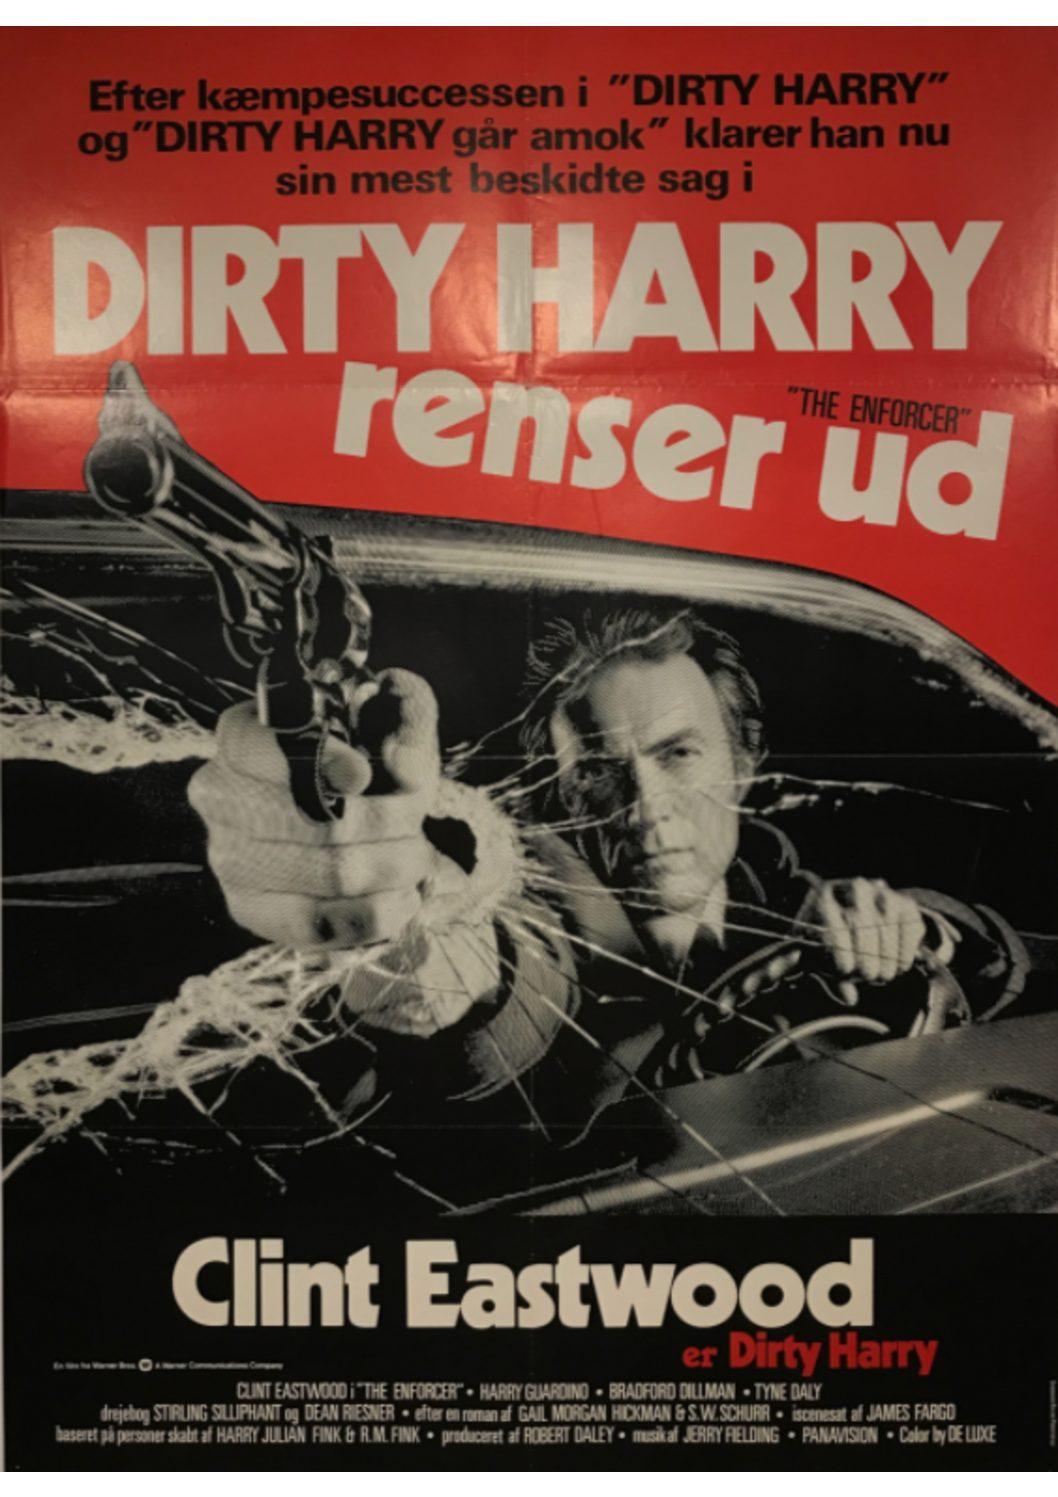 Dirty Harry Renser Ud